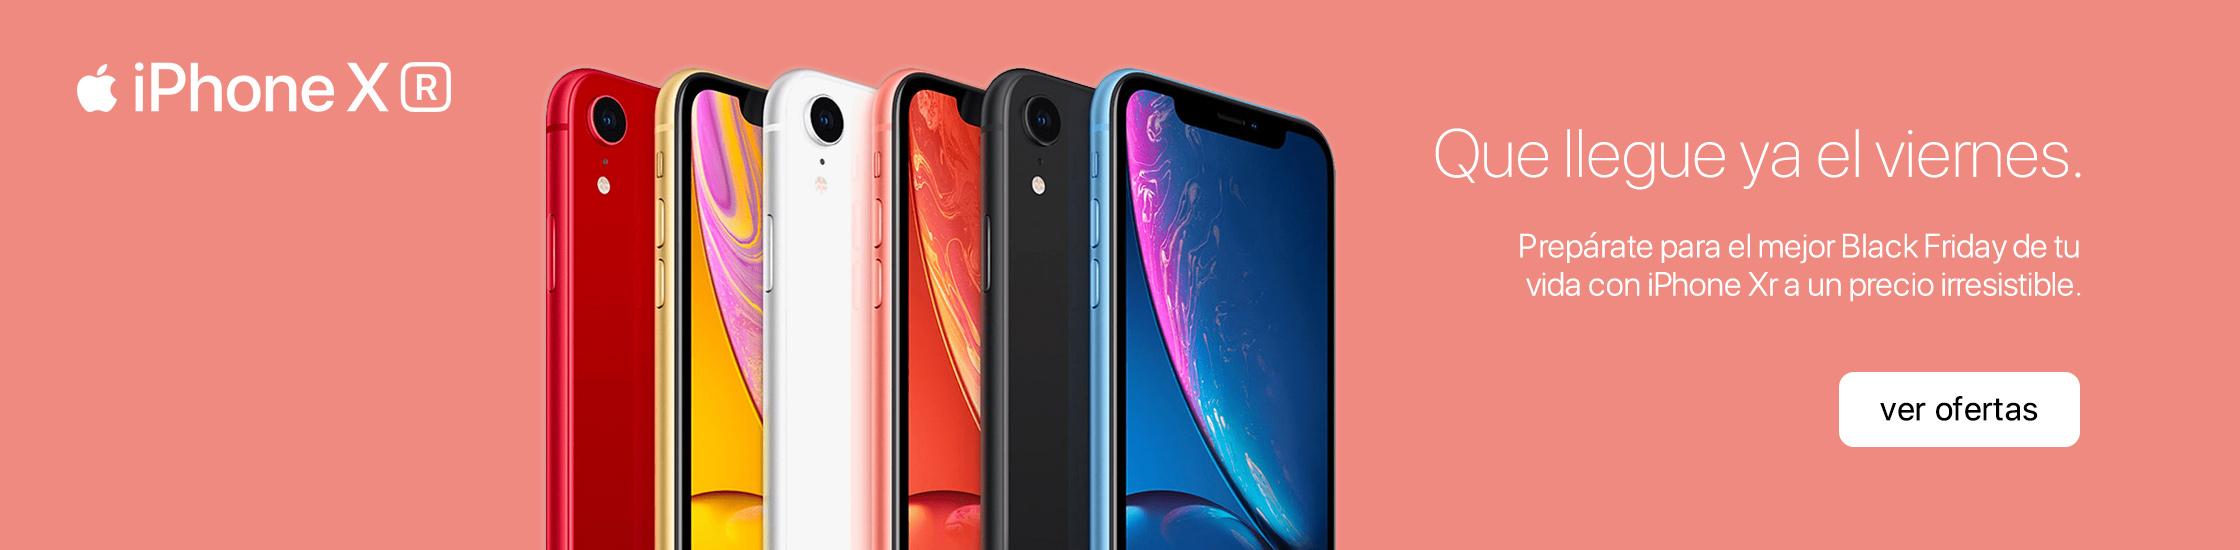 Black Friday iPhone XR 2021   Macnificos